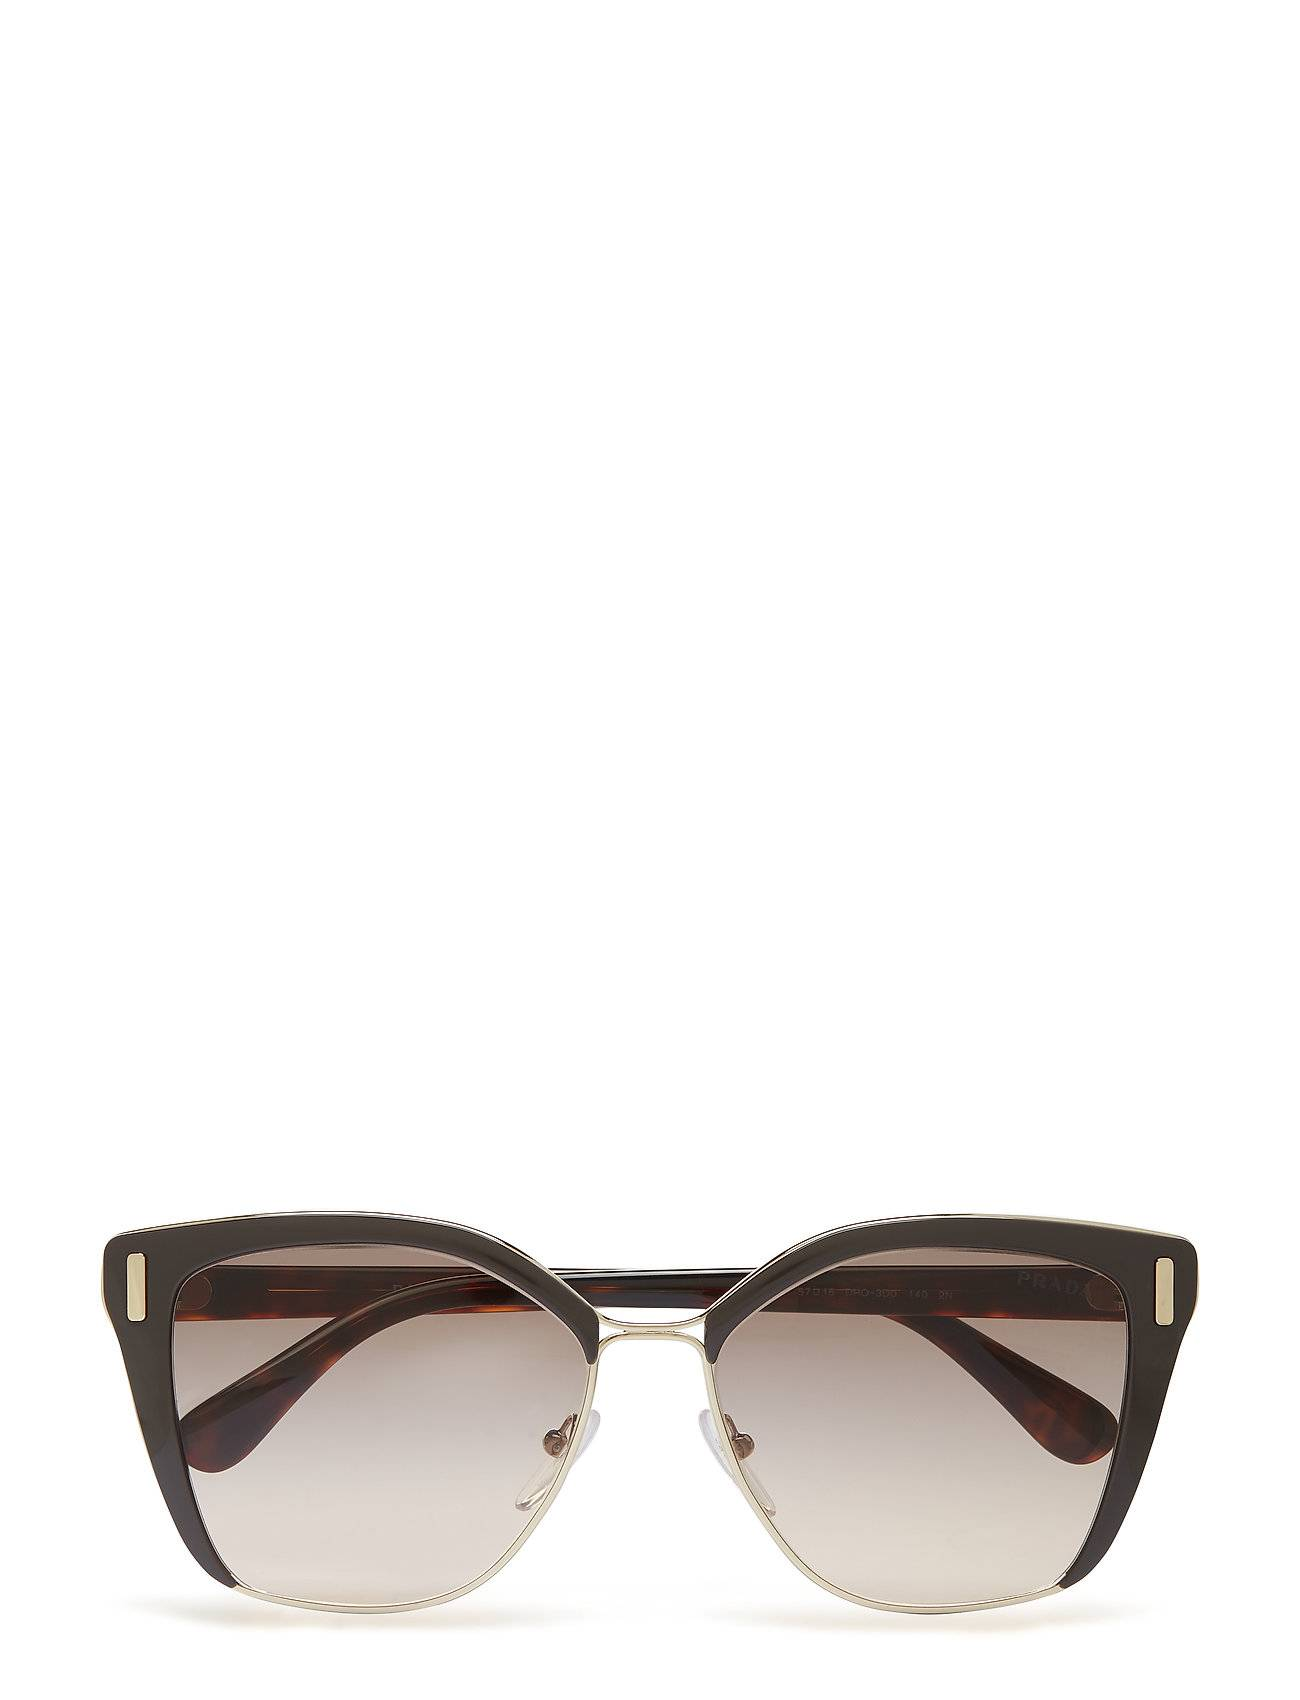 Image of Prada Sunglasses 0pr 56ts Neliönmuotoiset Aurinkolasit Ruskea